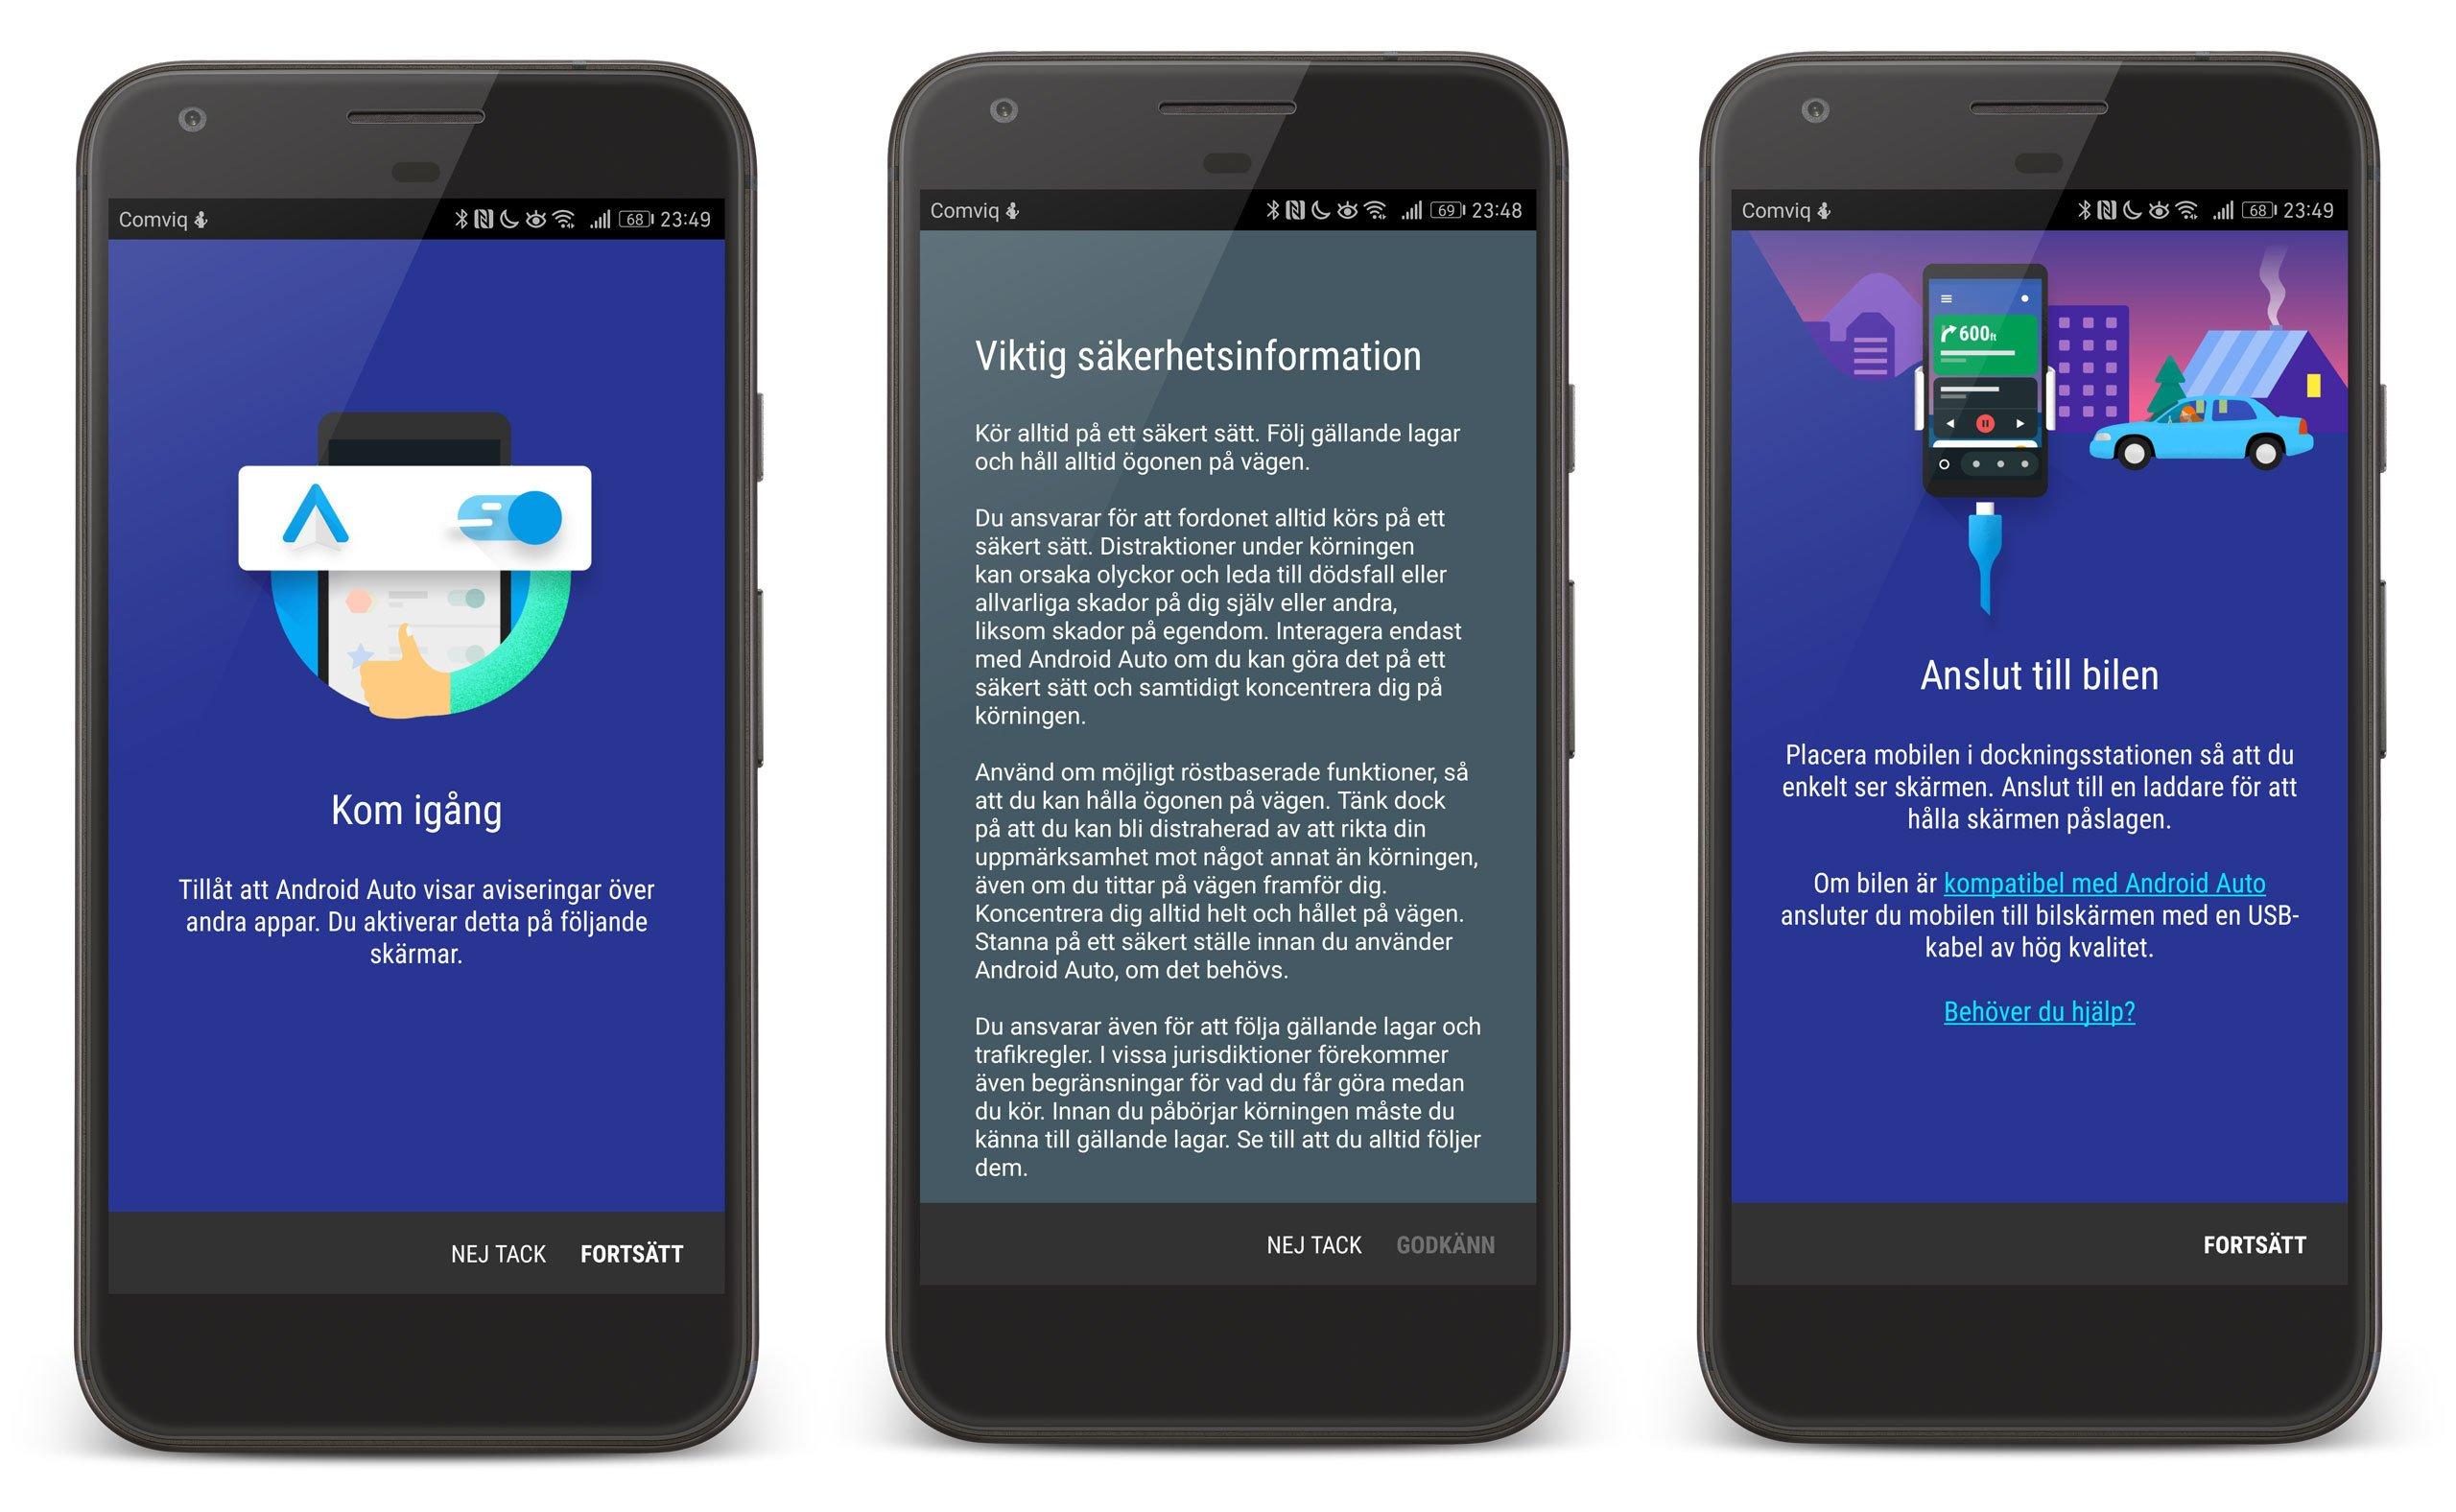 Android Auto i Sverige? | Sida 5 | Swedroid forum Nordens